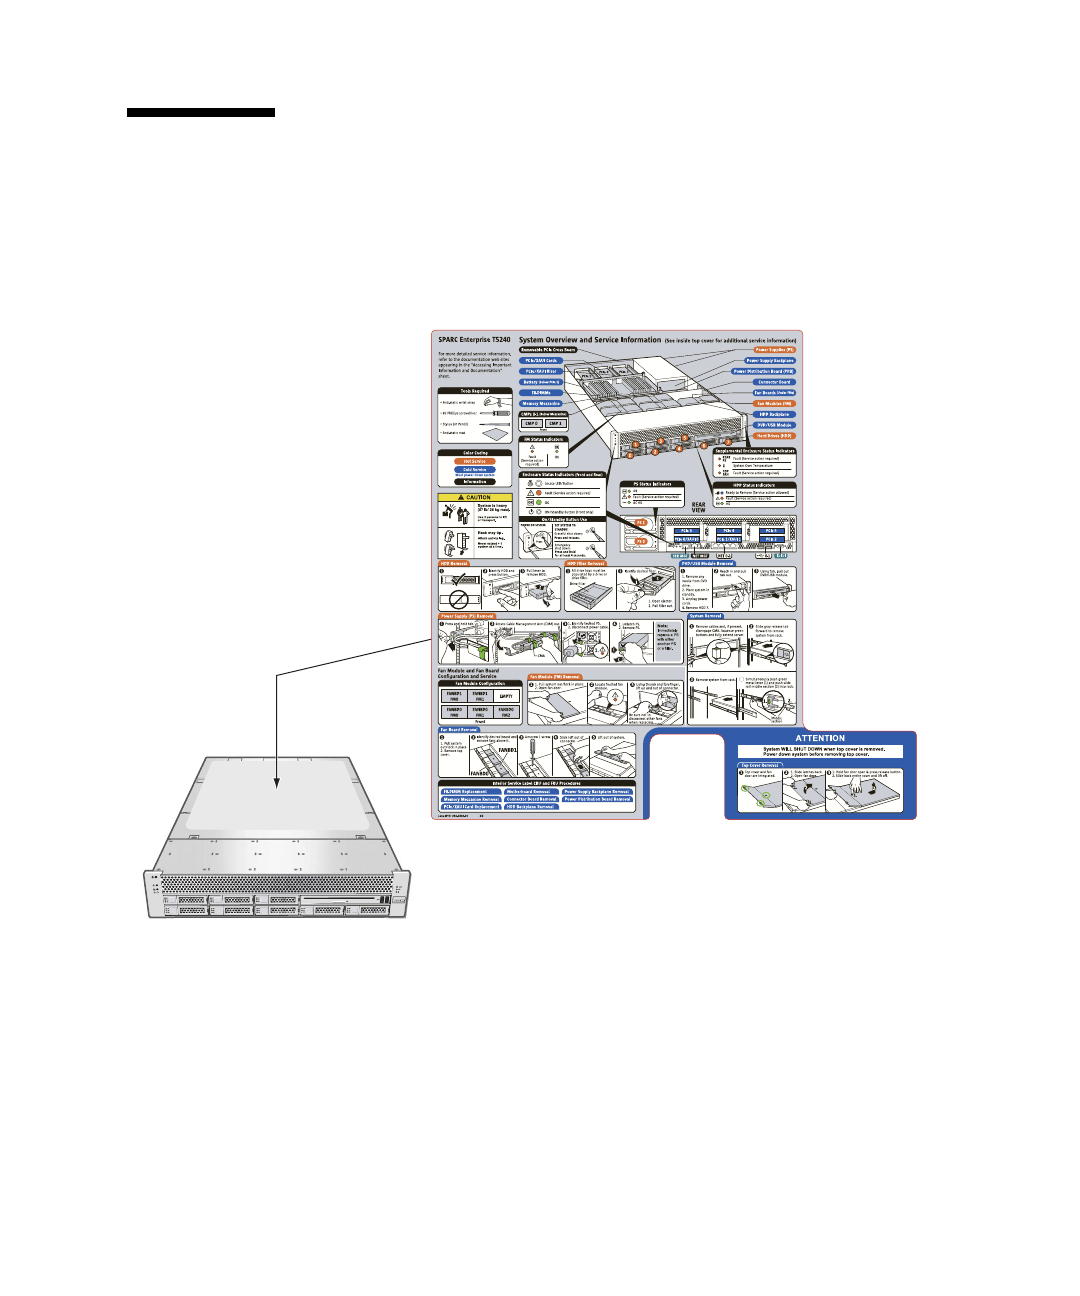 Fujitsu Sparc T5220 Users Manual Enterprise T5120 And